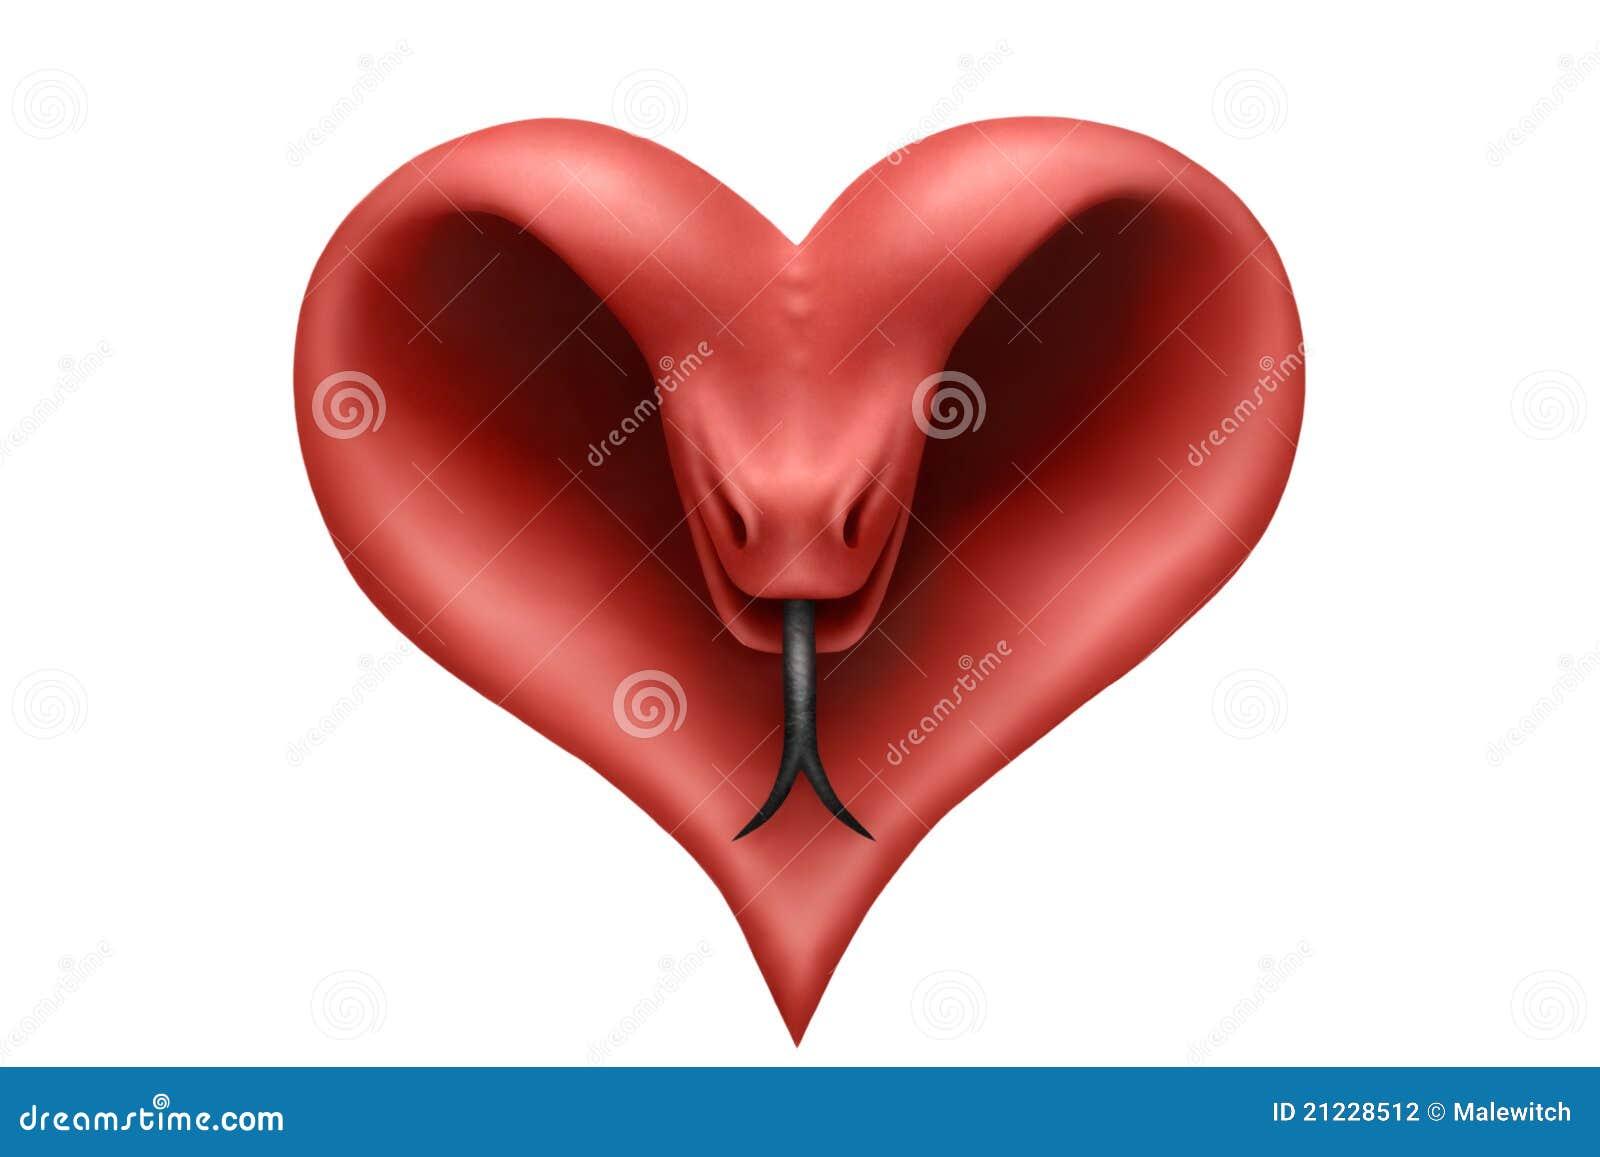 Heart Snake Stock Photography - Image: 21228512